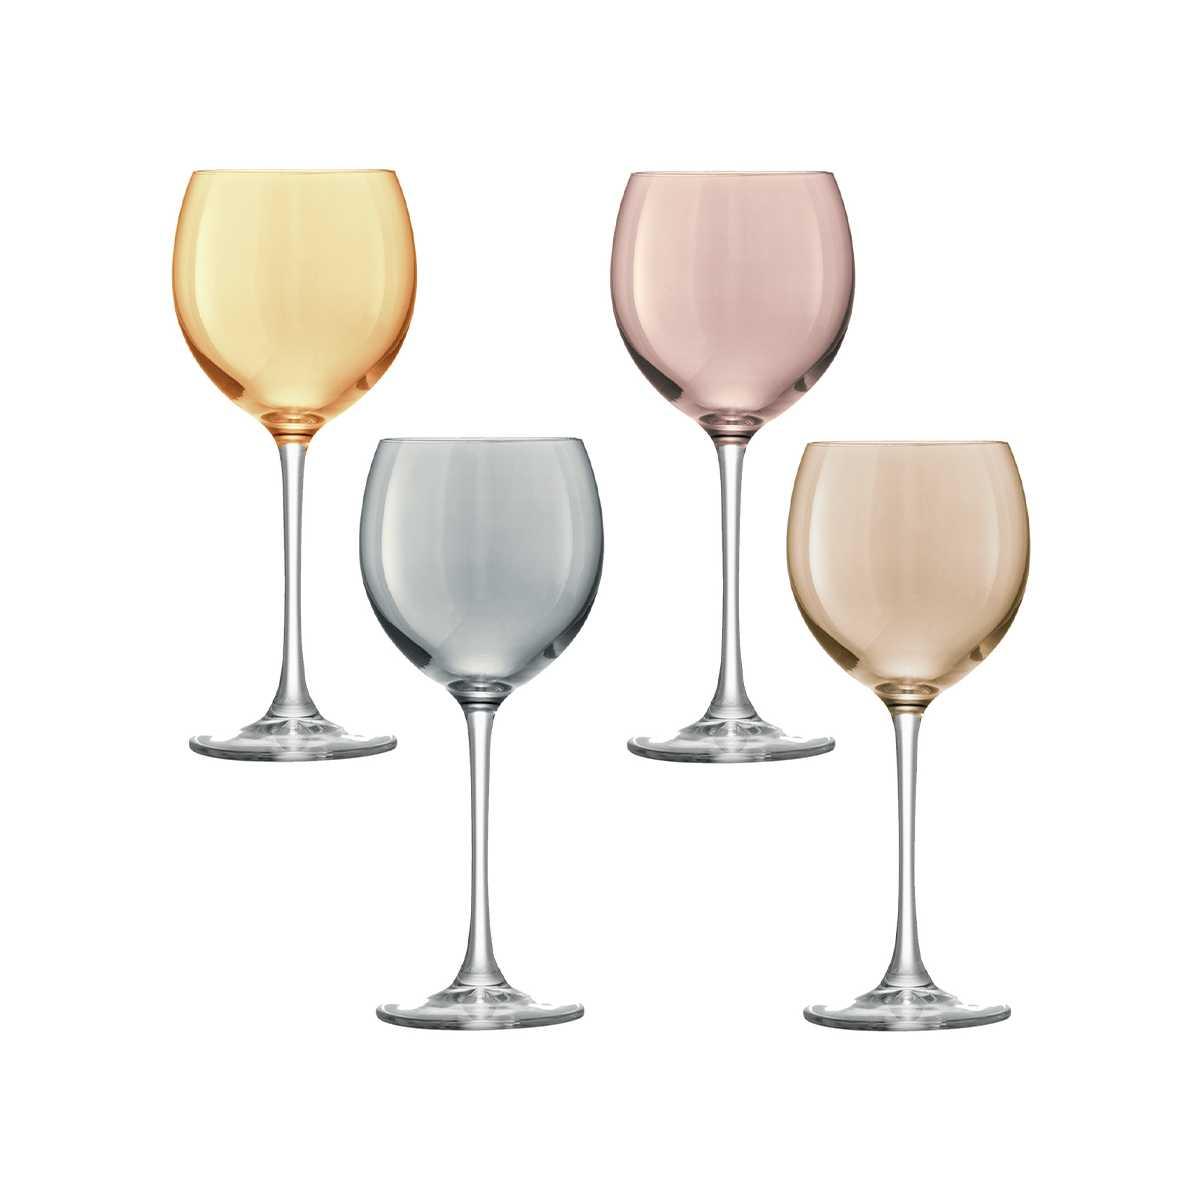 Онлайн каталог PROMENU: Набор бокалов для вина LSA, объем 0,4 л, 4 шт. LSA G932-14-960